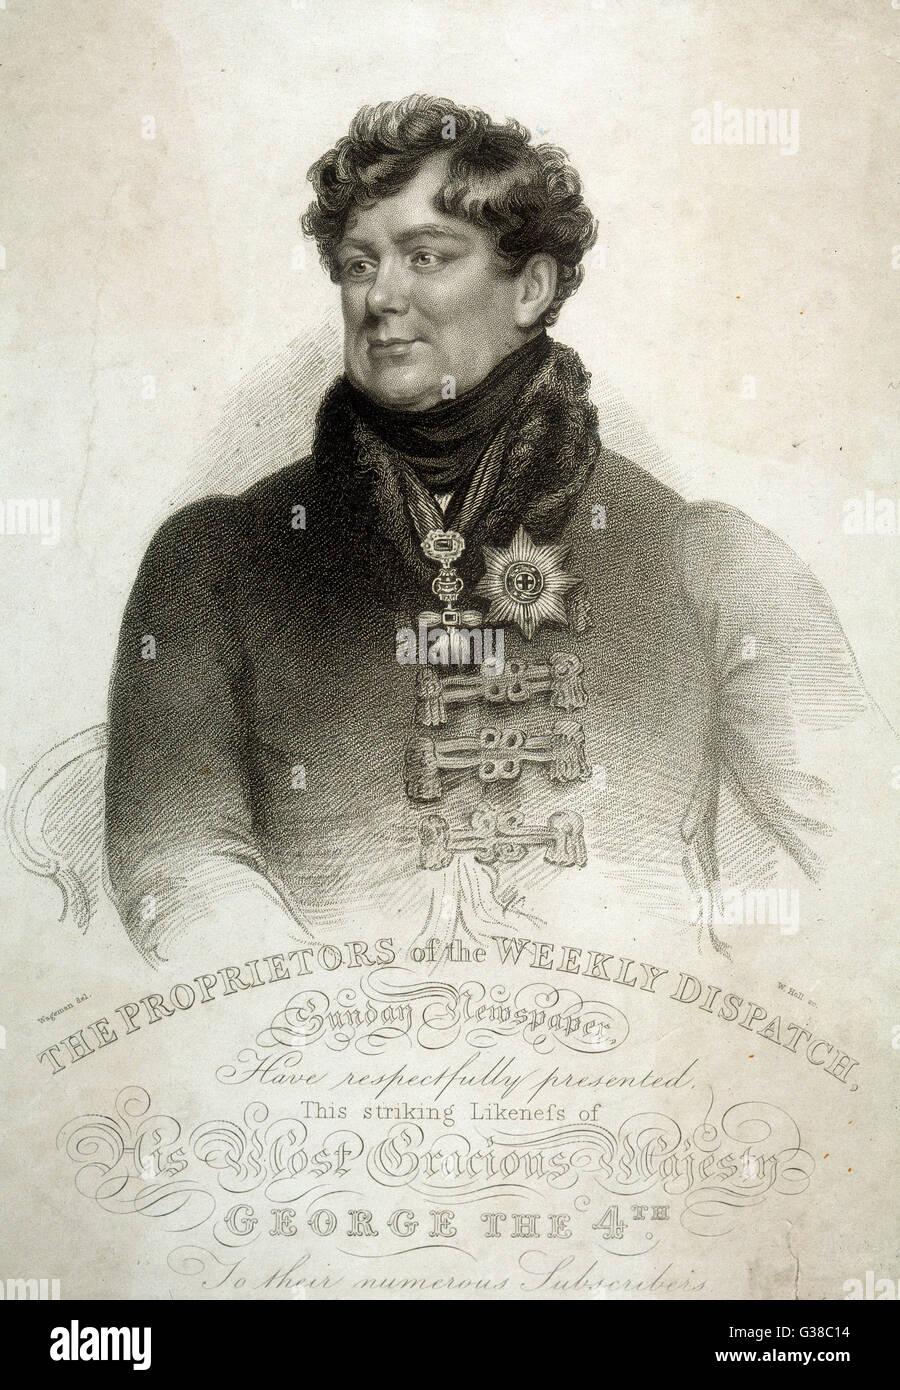 KING GEORGE IV OF ENGLAND  Half-length portrait        Date: 1762 - 1830 - Stock Image